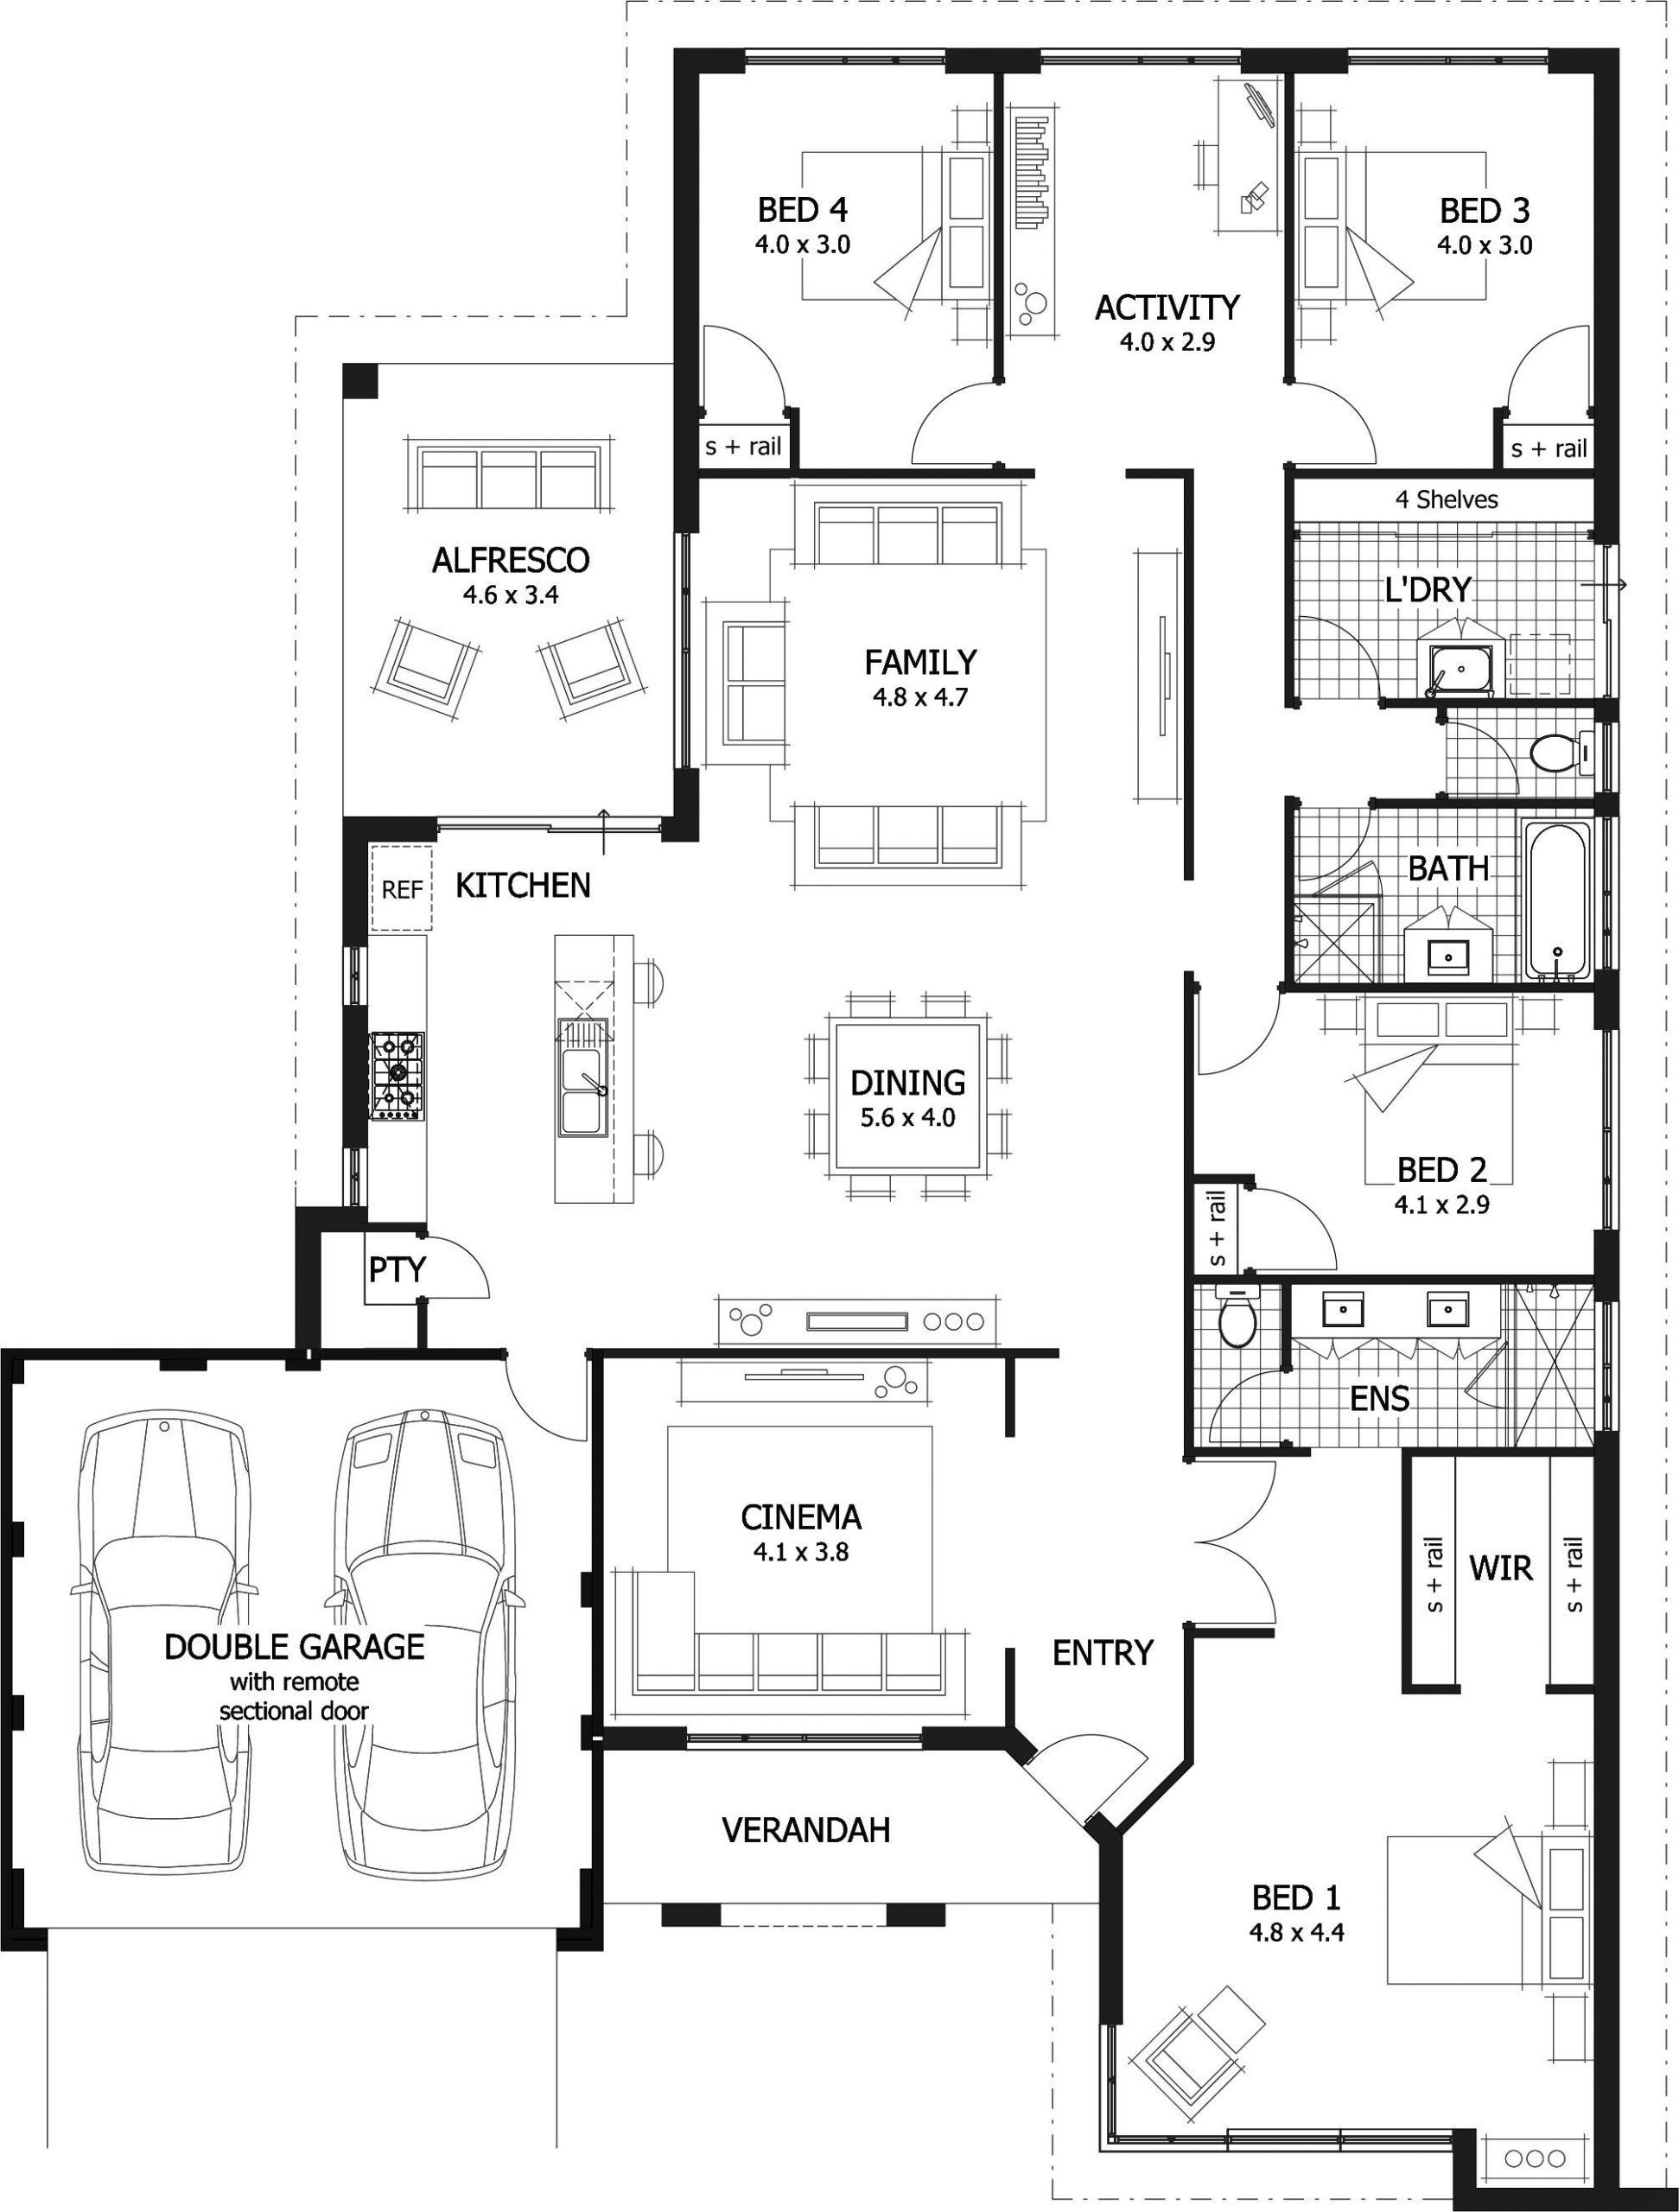 4 Bedroom Home Designs Bedroom Designs Home In 2020 House Plans Australia Bedroom House Plans 4 Bedroom House Plans